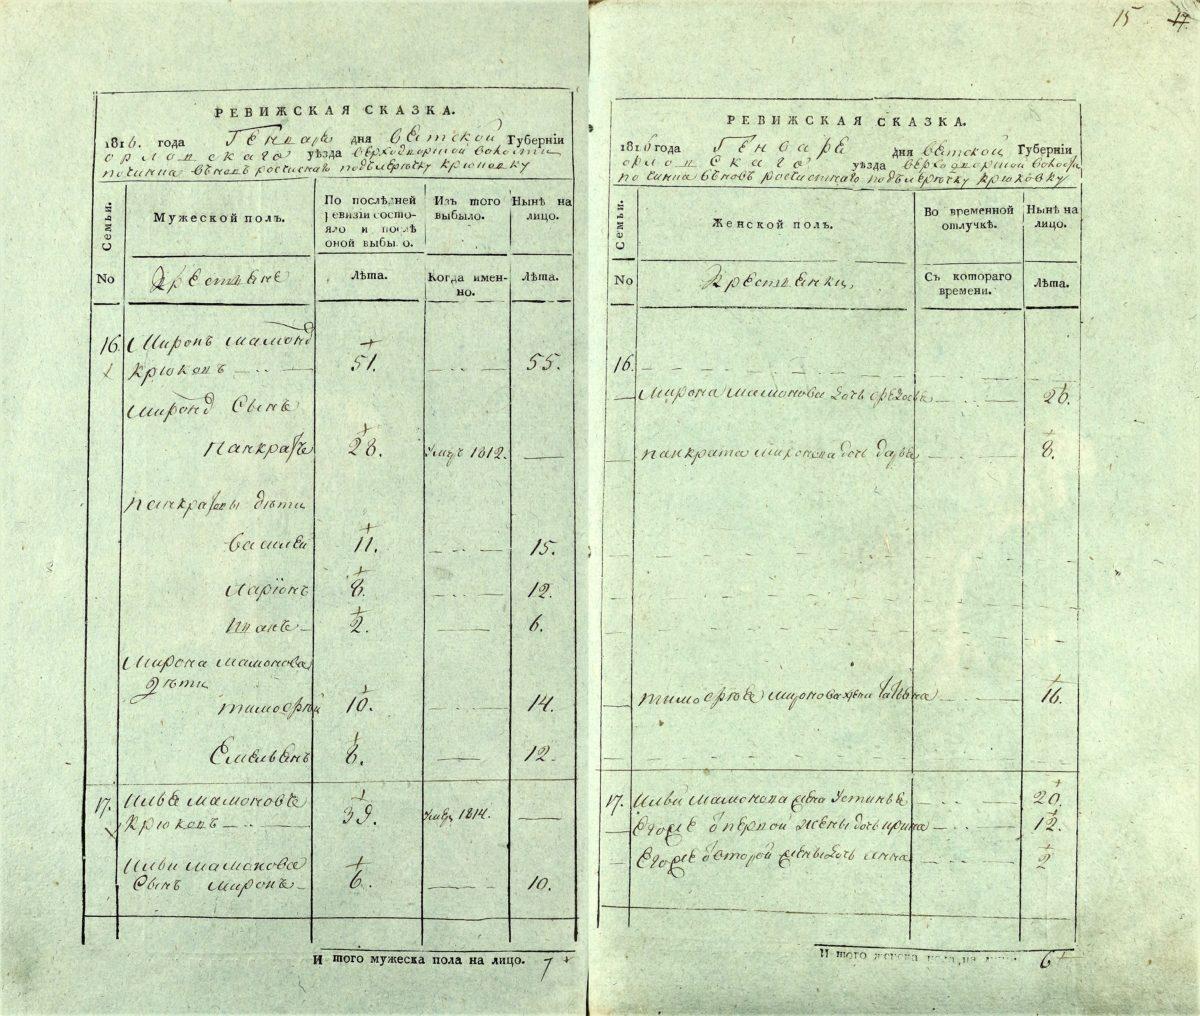 Ревизская сказка 1816 года, ЦГАКО ф. 176, оп. 2, д. 506, л. 14об-15. Крюковы